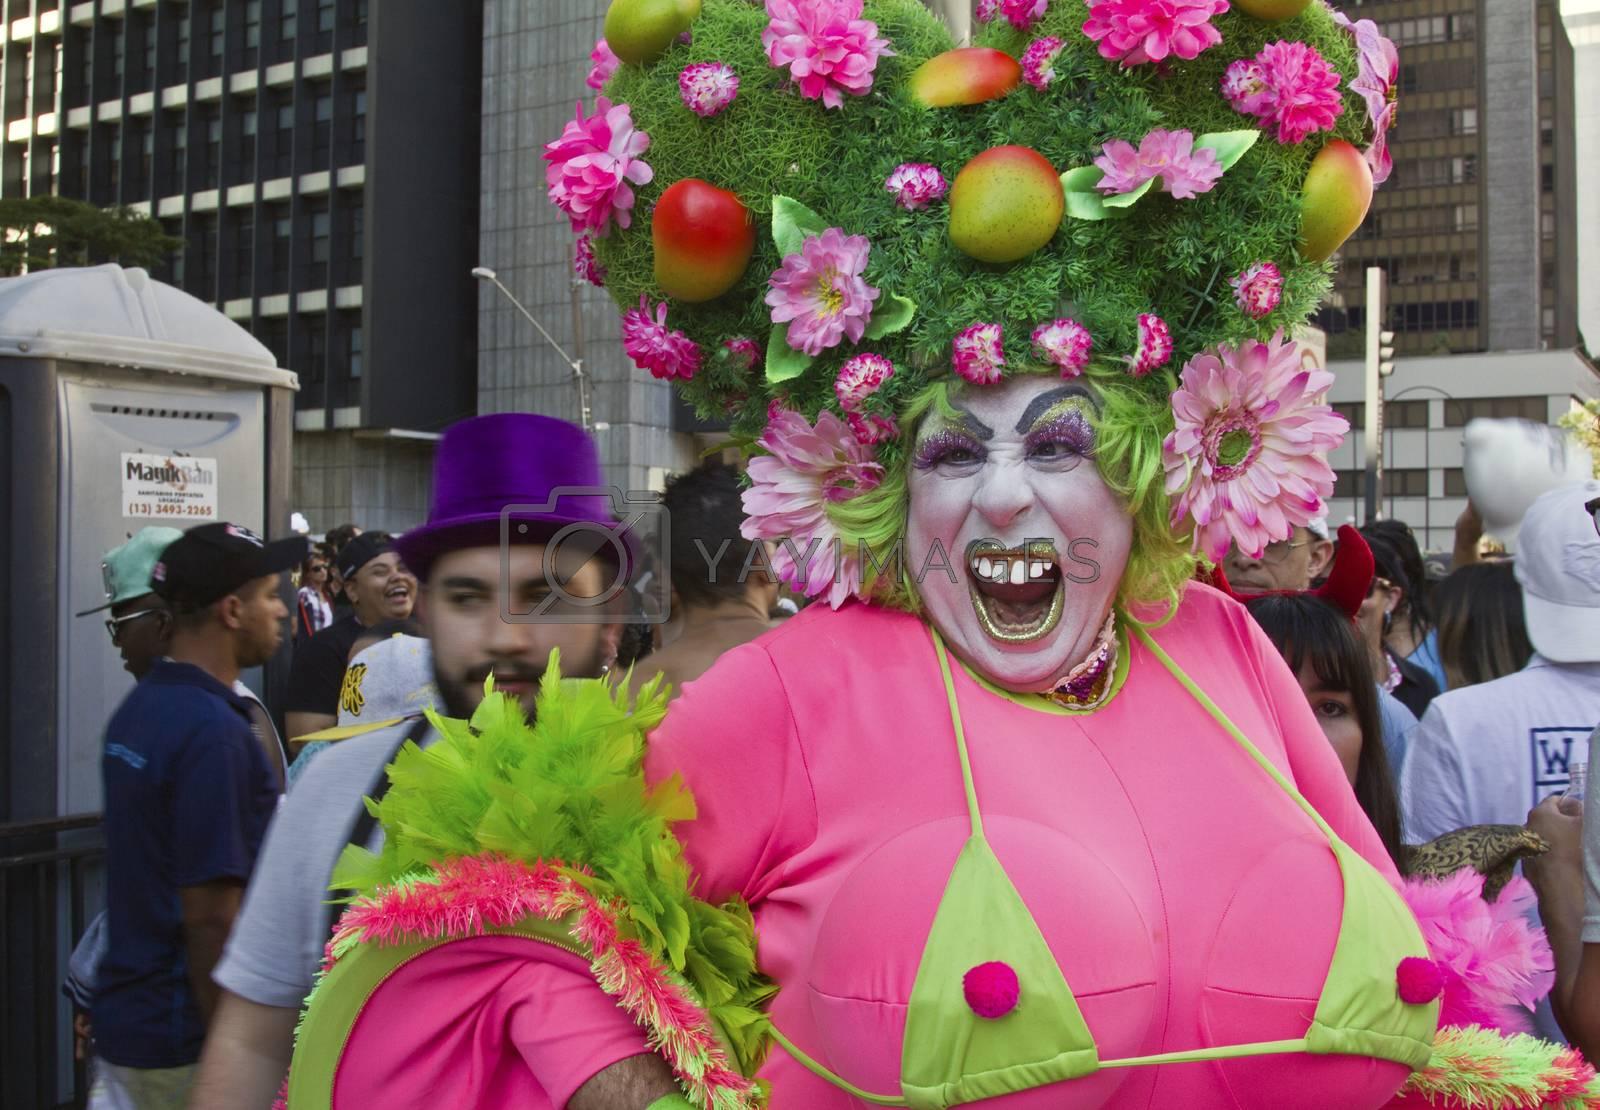 Drag Queen in Pride Parade Sao Paulo by marphotography